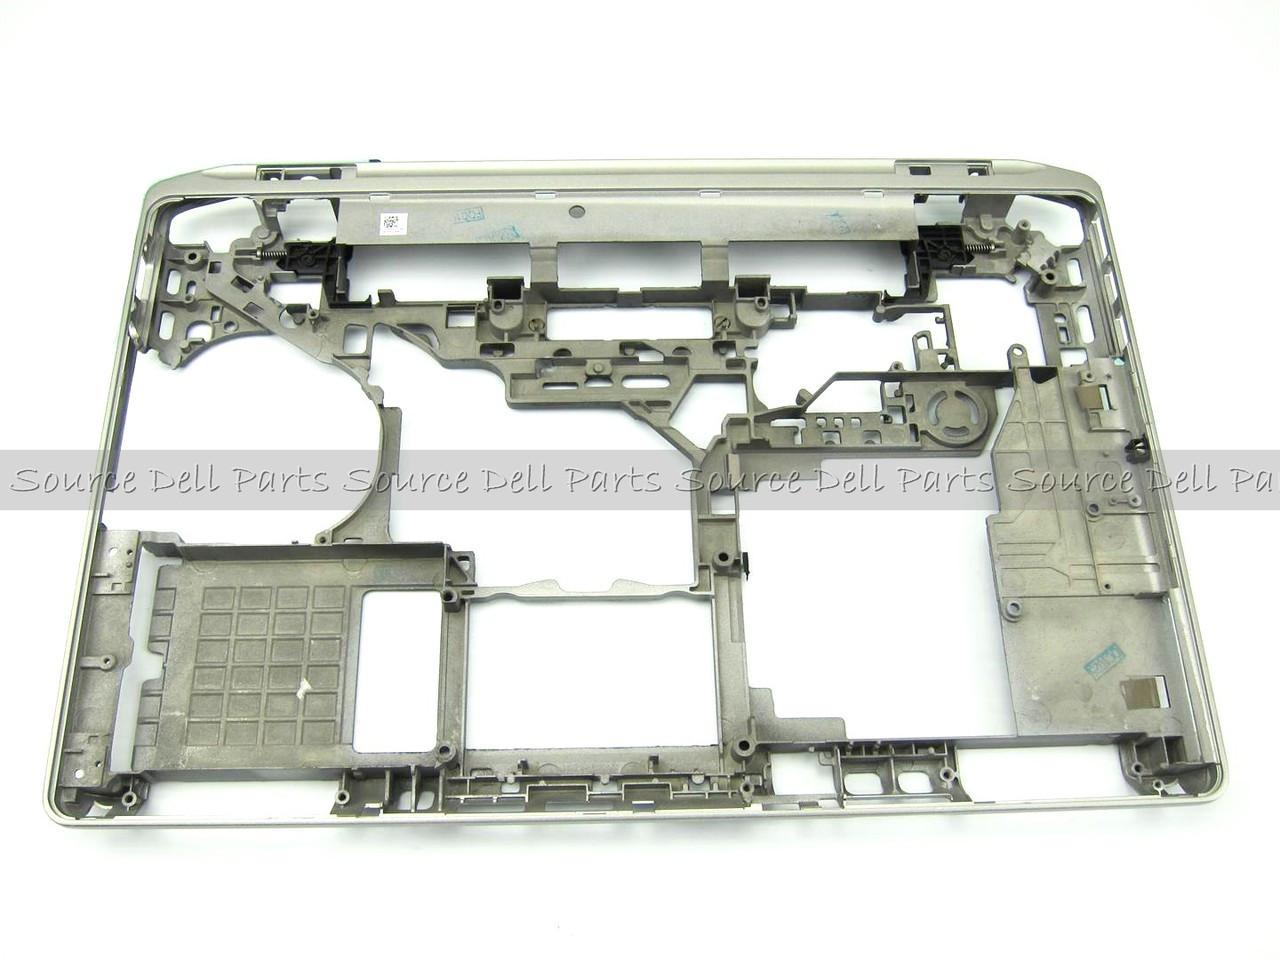 Dell Latitude E6430 Laptop Bottom Base Case Assembly - 2P6CJ (B)